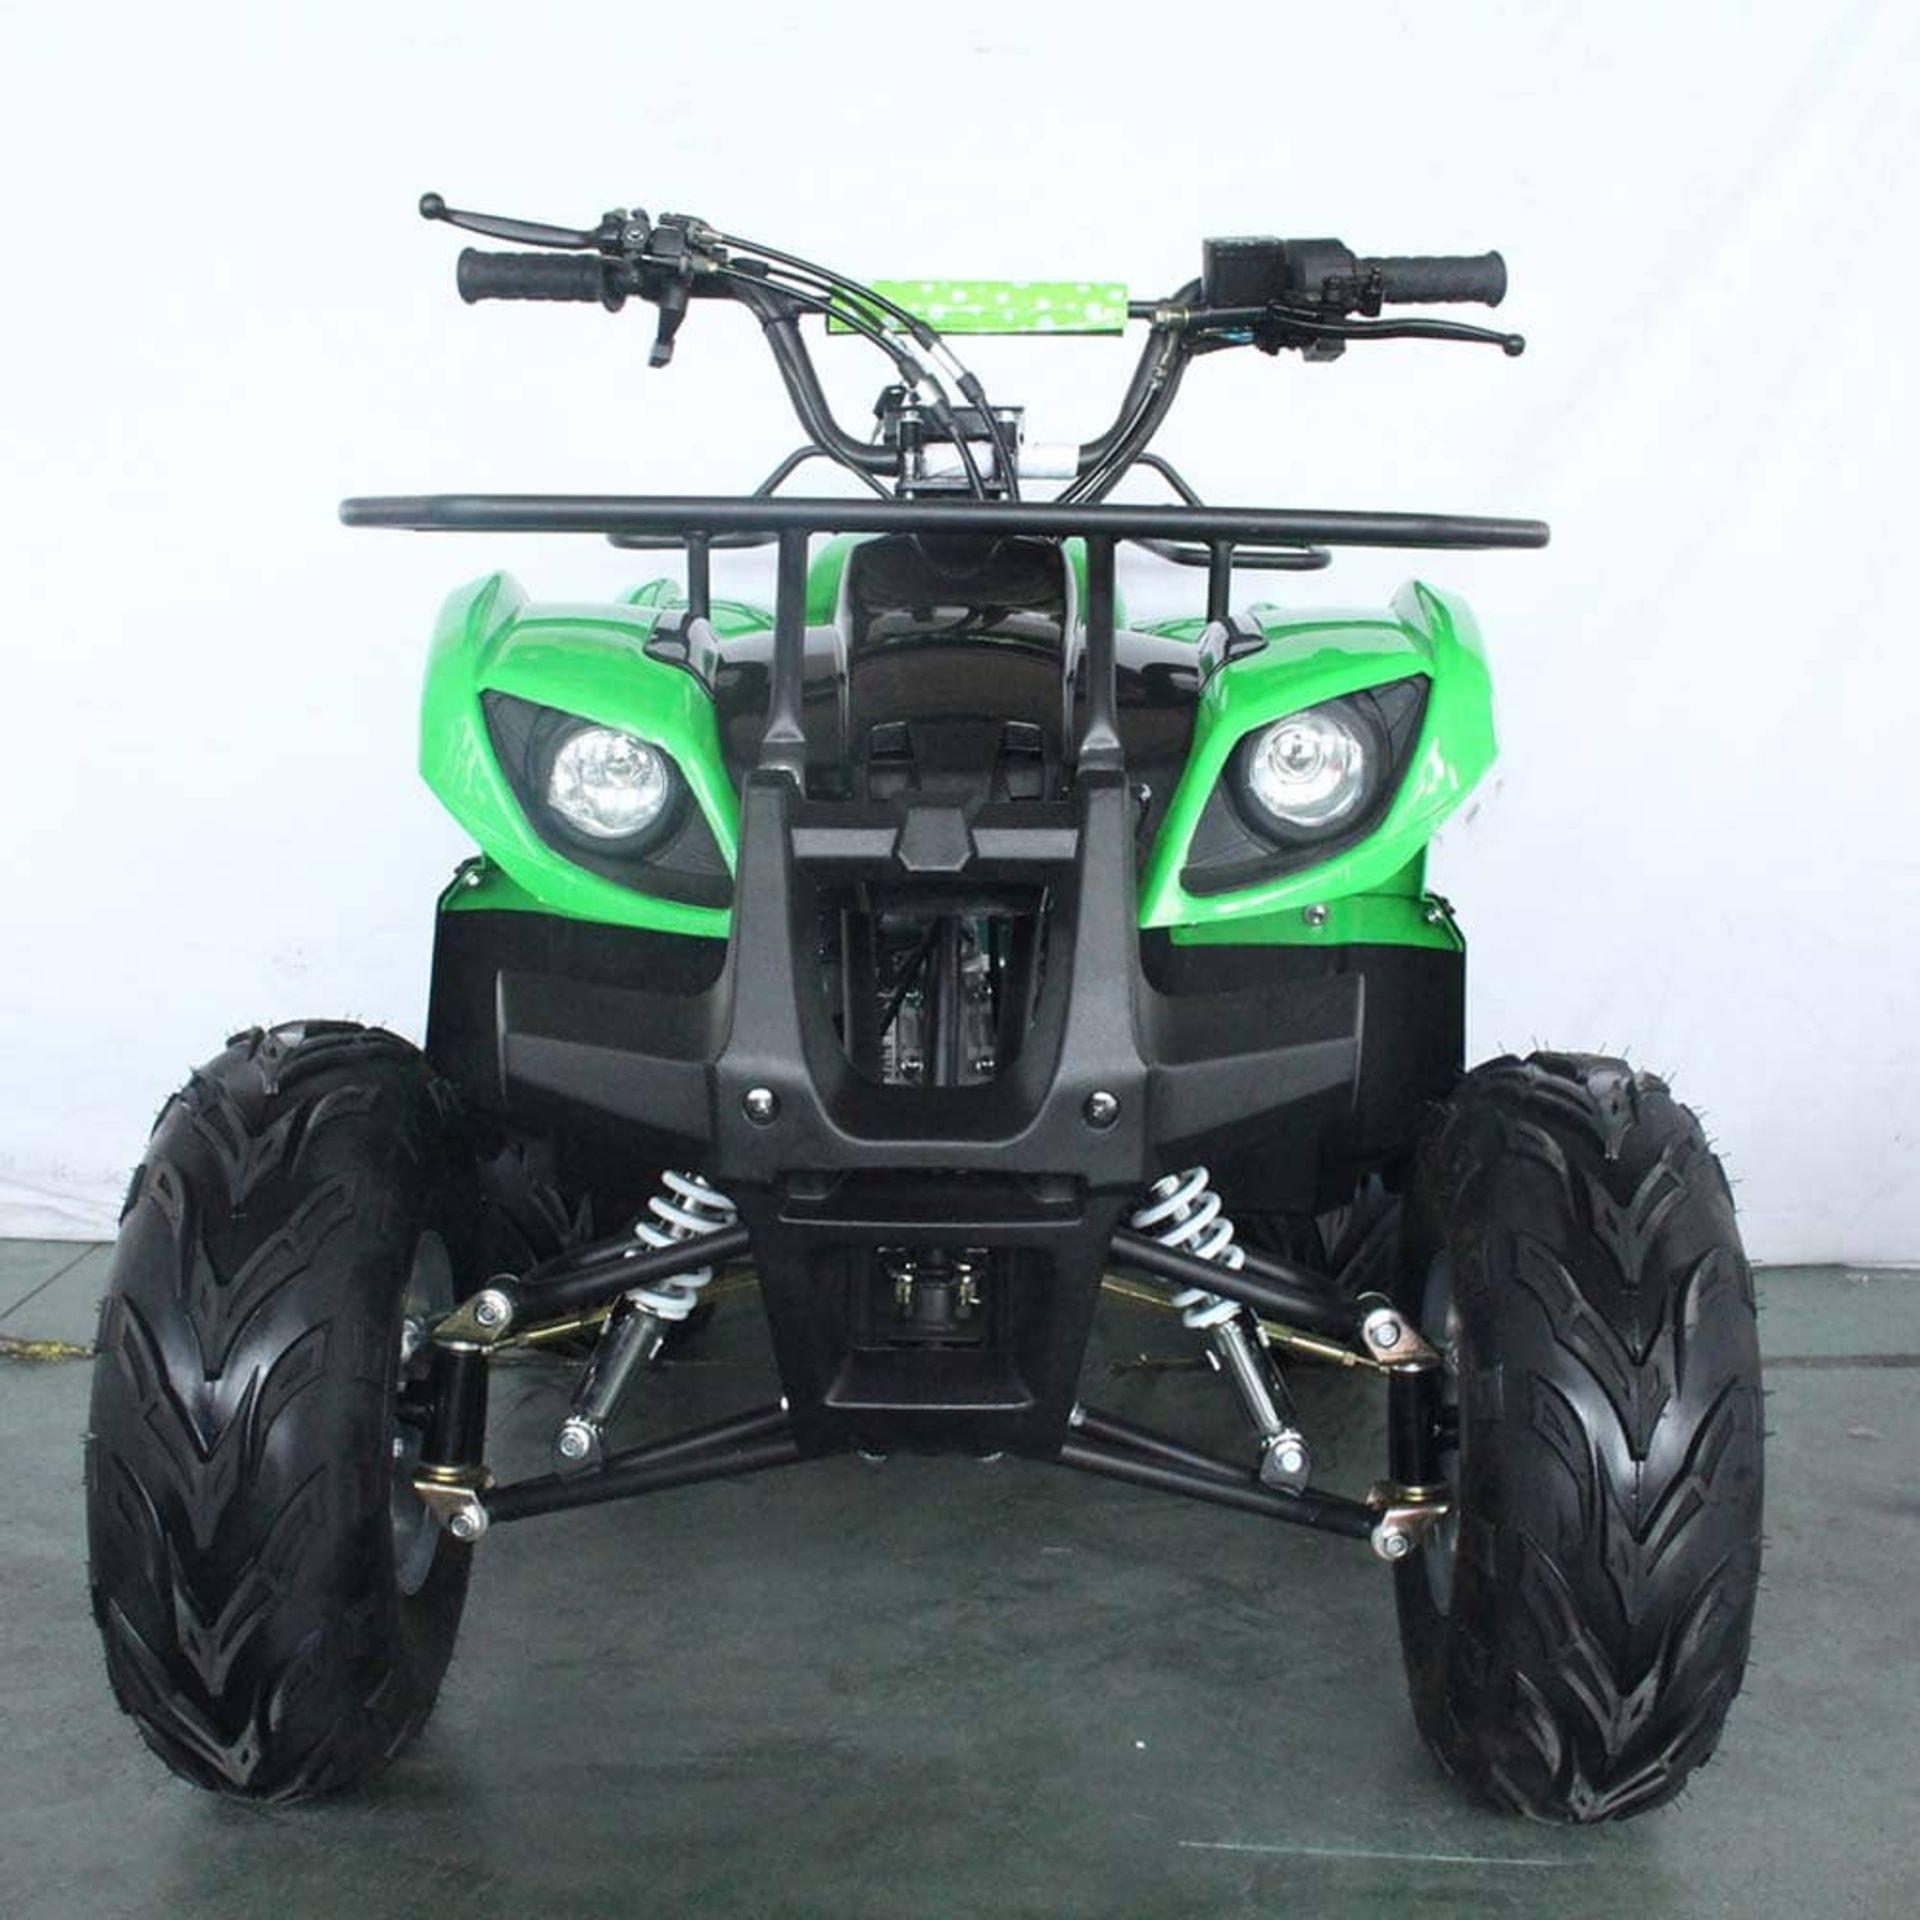 + VAT Brand New 125cc Condor Quad Bike - Four Stroke - Single Cylinder - Front Drum Brakes & Rear - Image 8 of 9